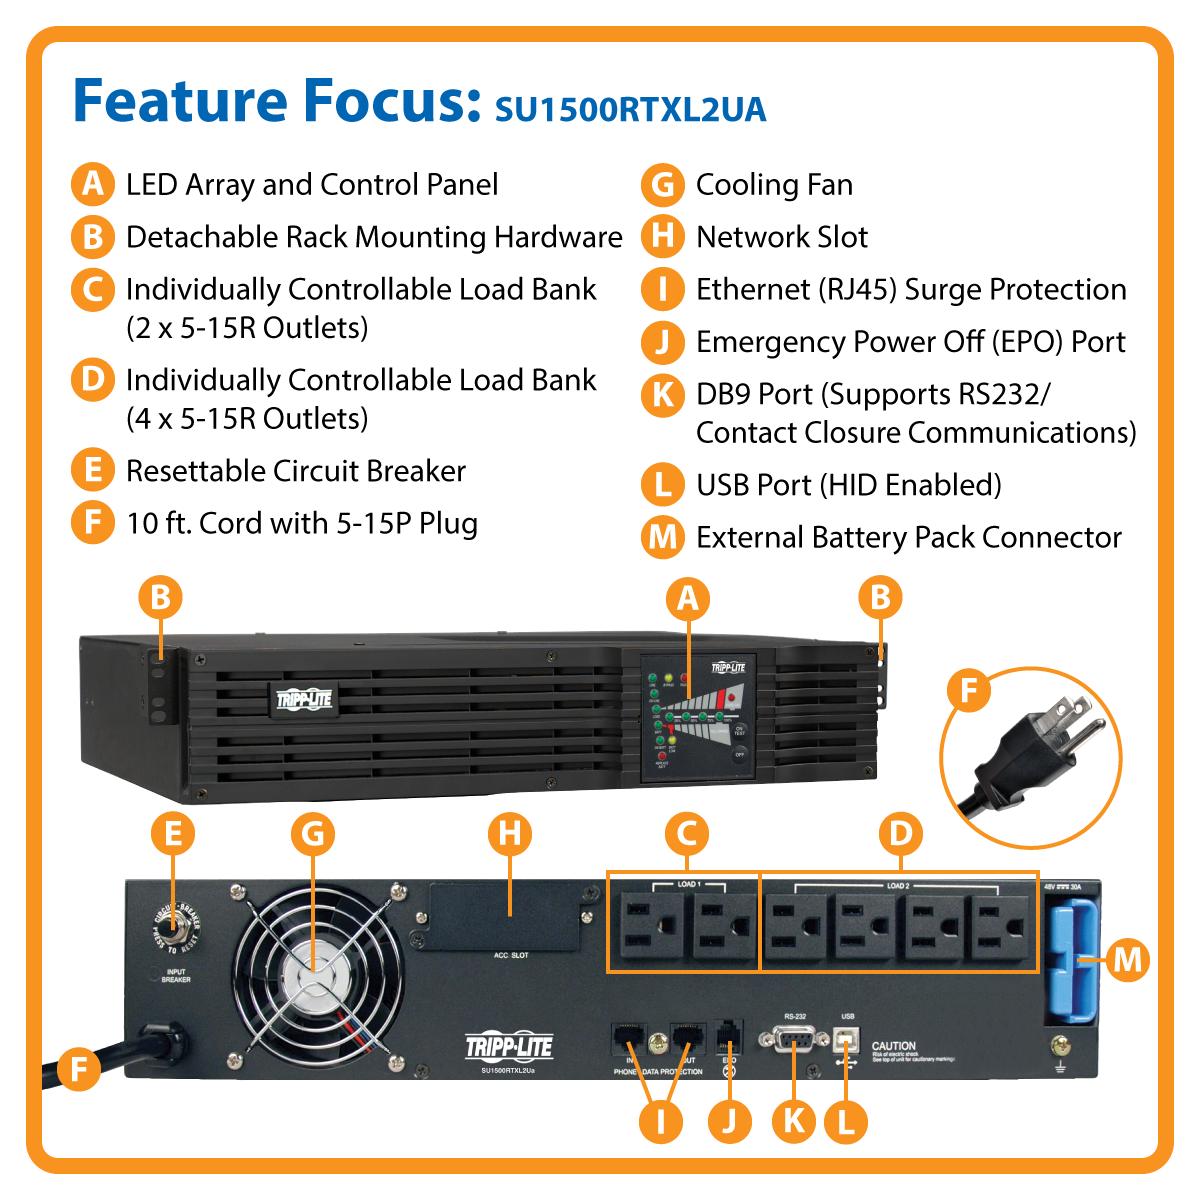 Tripp Lite 1500VA Smart Online UPS, 1200W Double-Conversion, 2U Rack/Tower, on